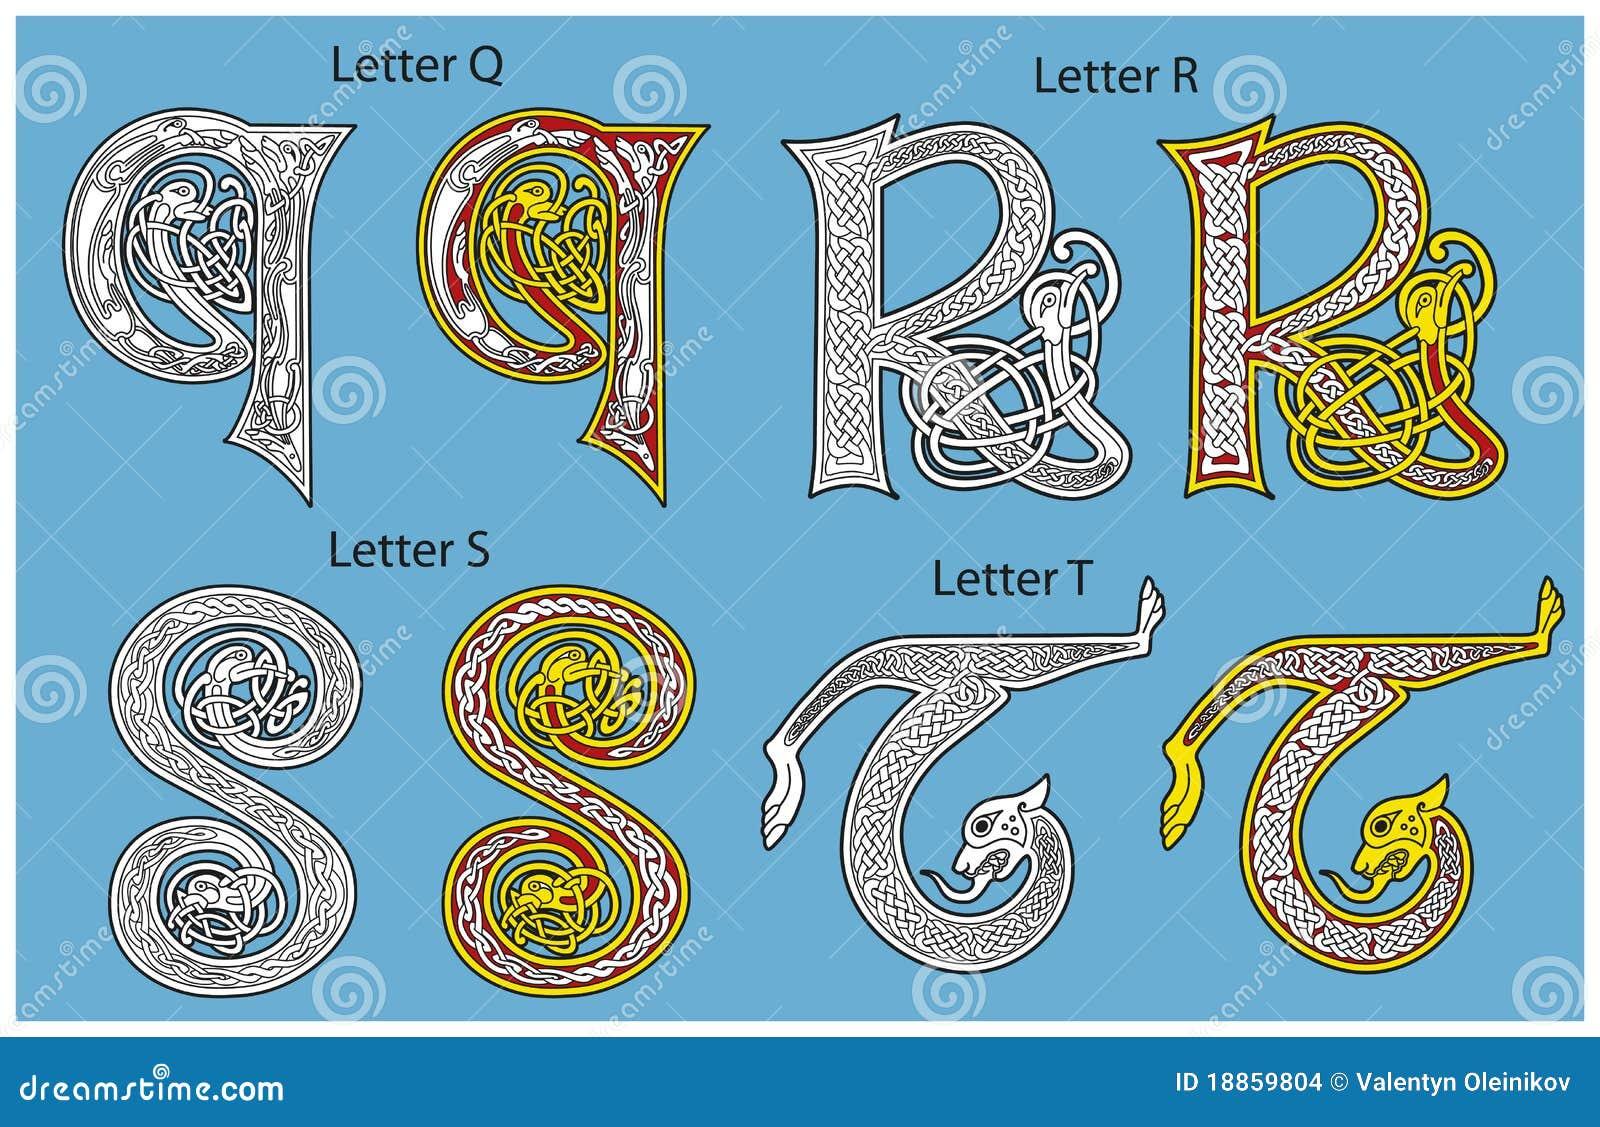 Old irish writing alphabet game